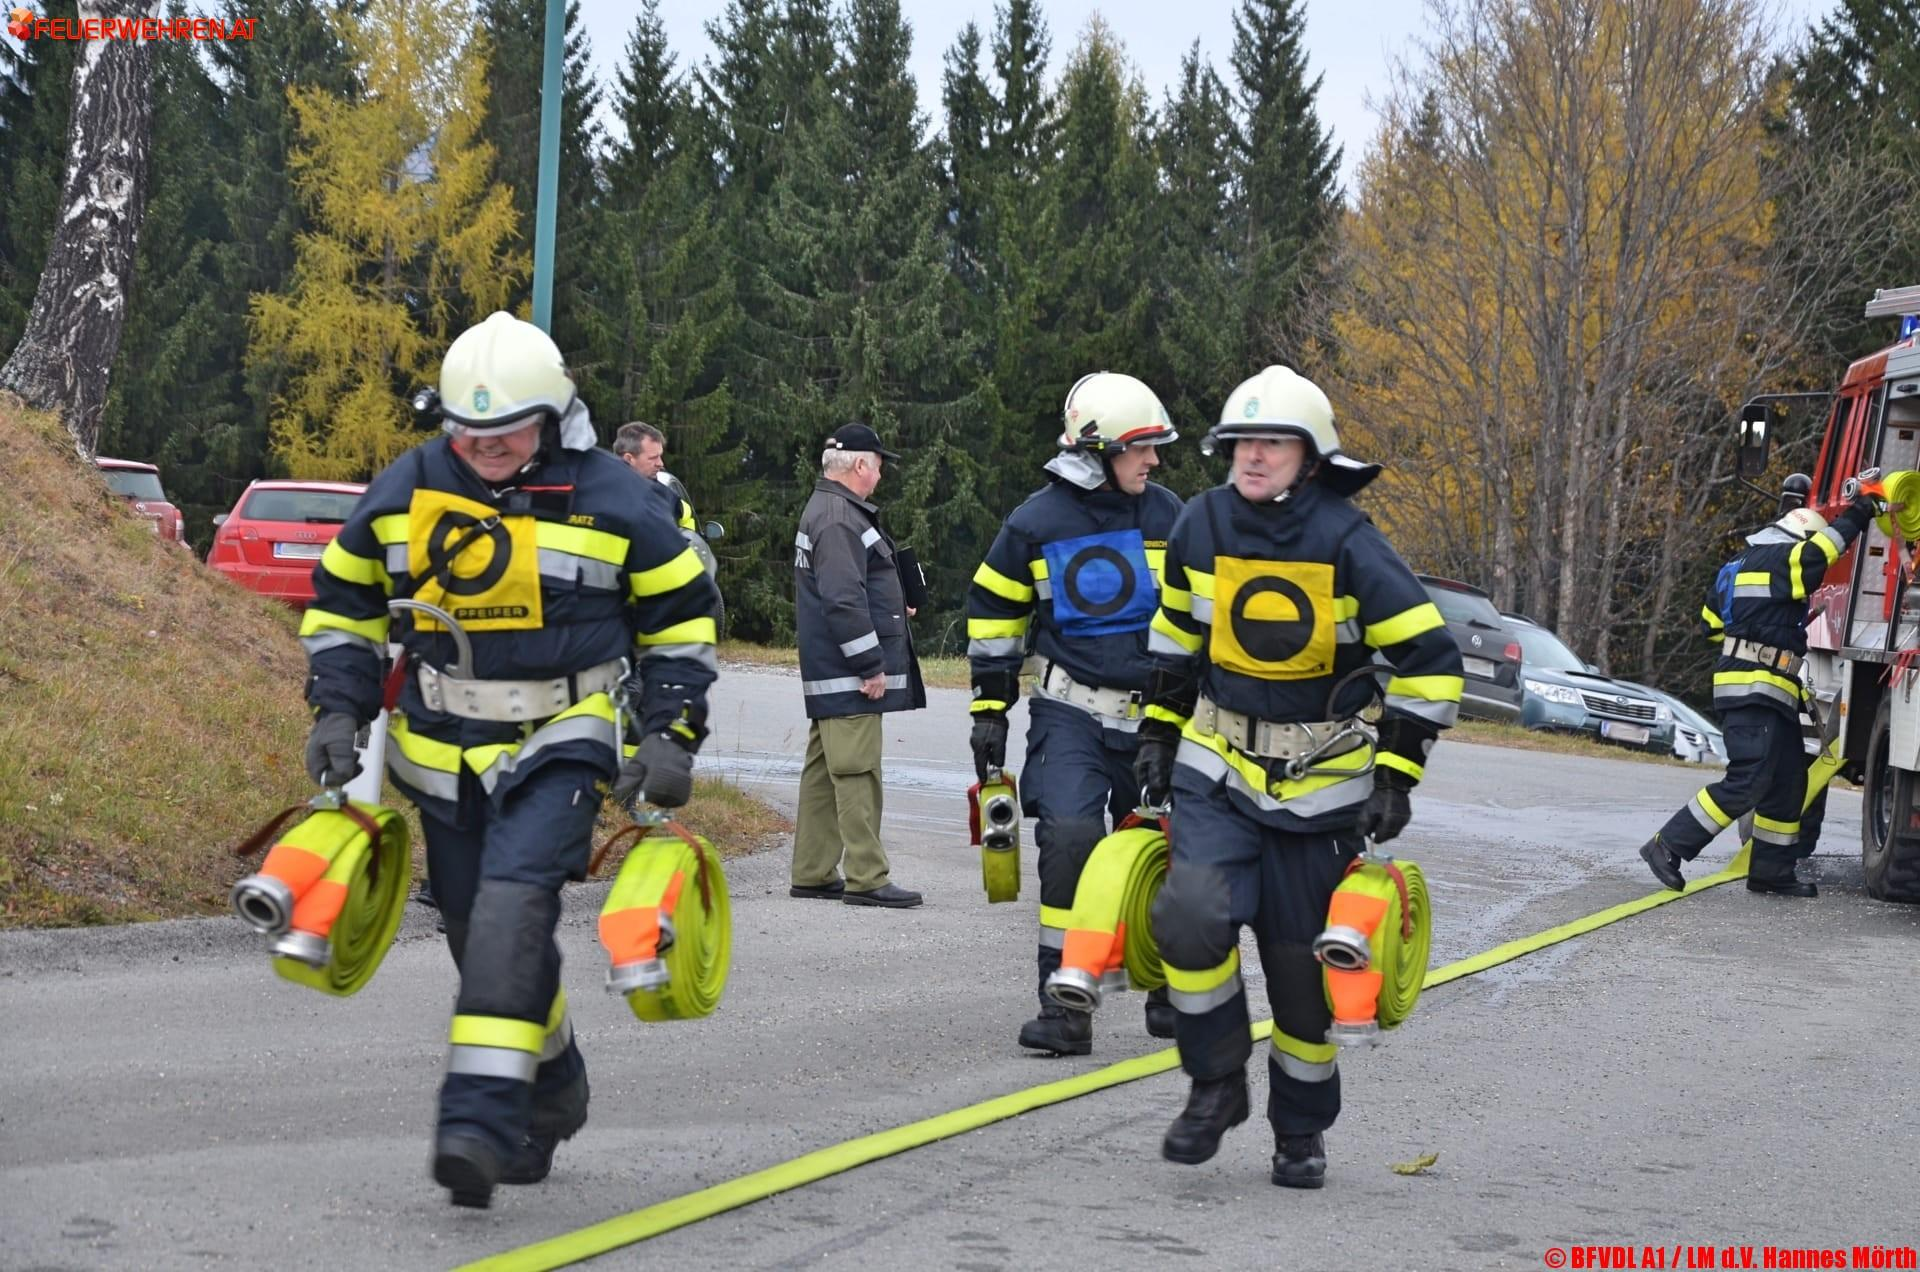 BFVDL A1 / LM d.V. Hannes Mörth